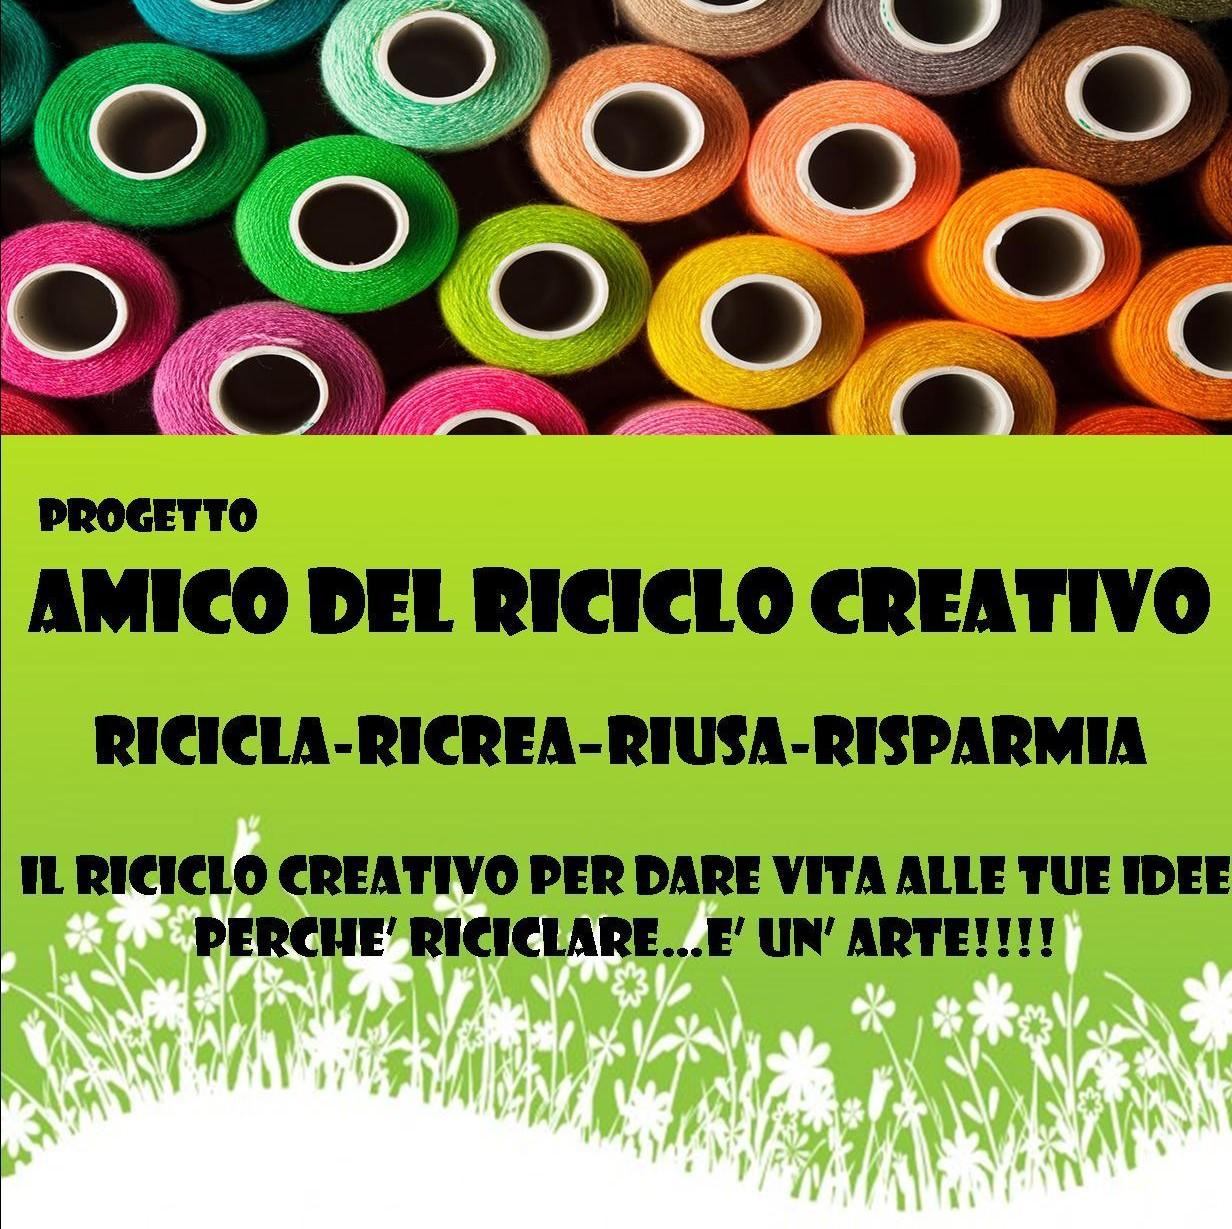 locandina riciclo-bis